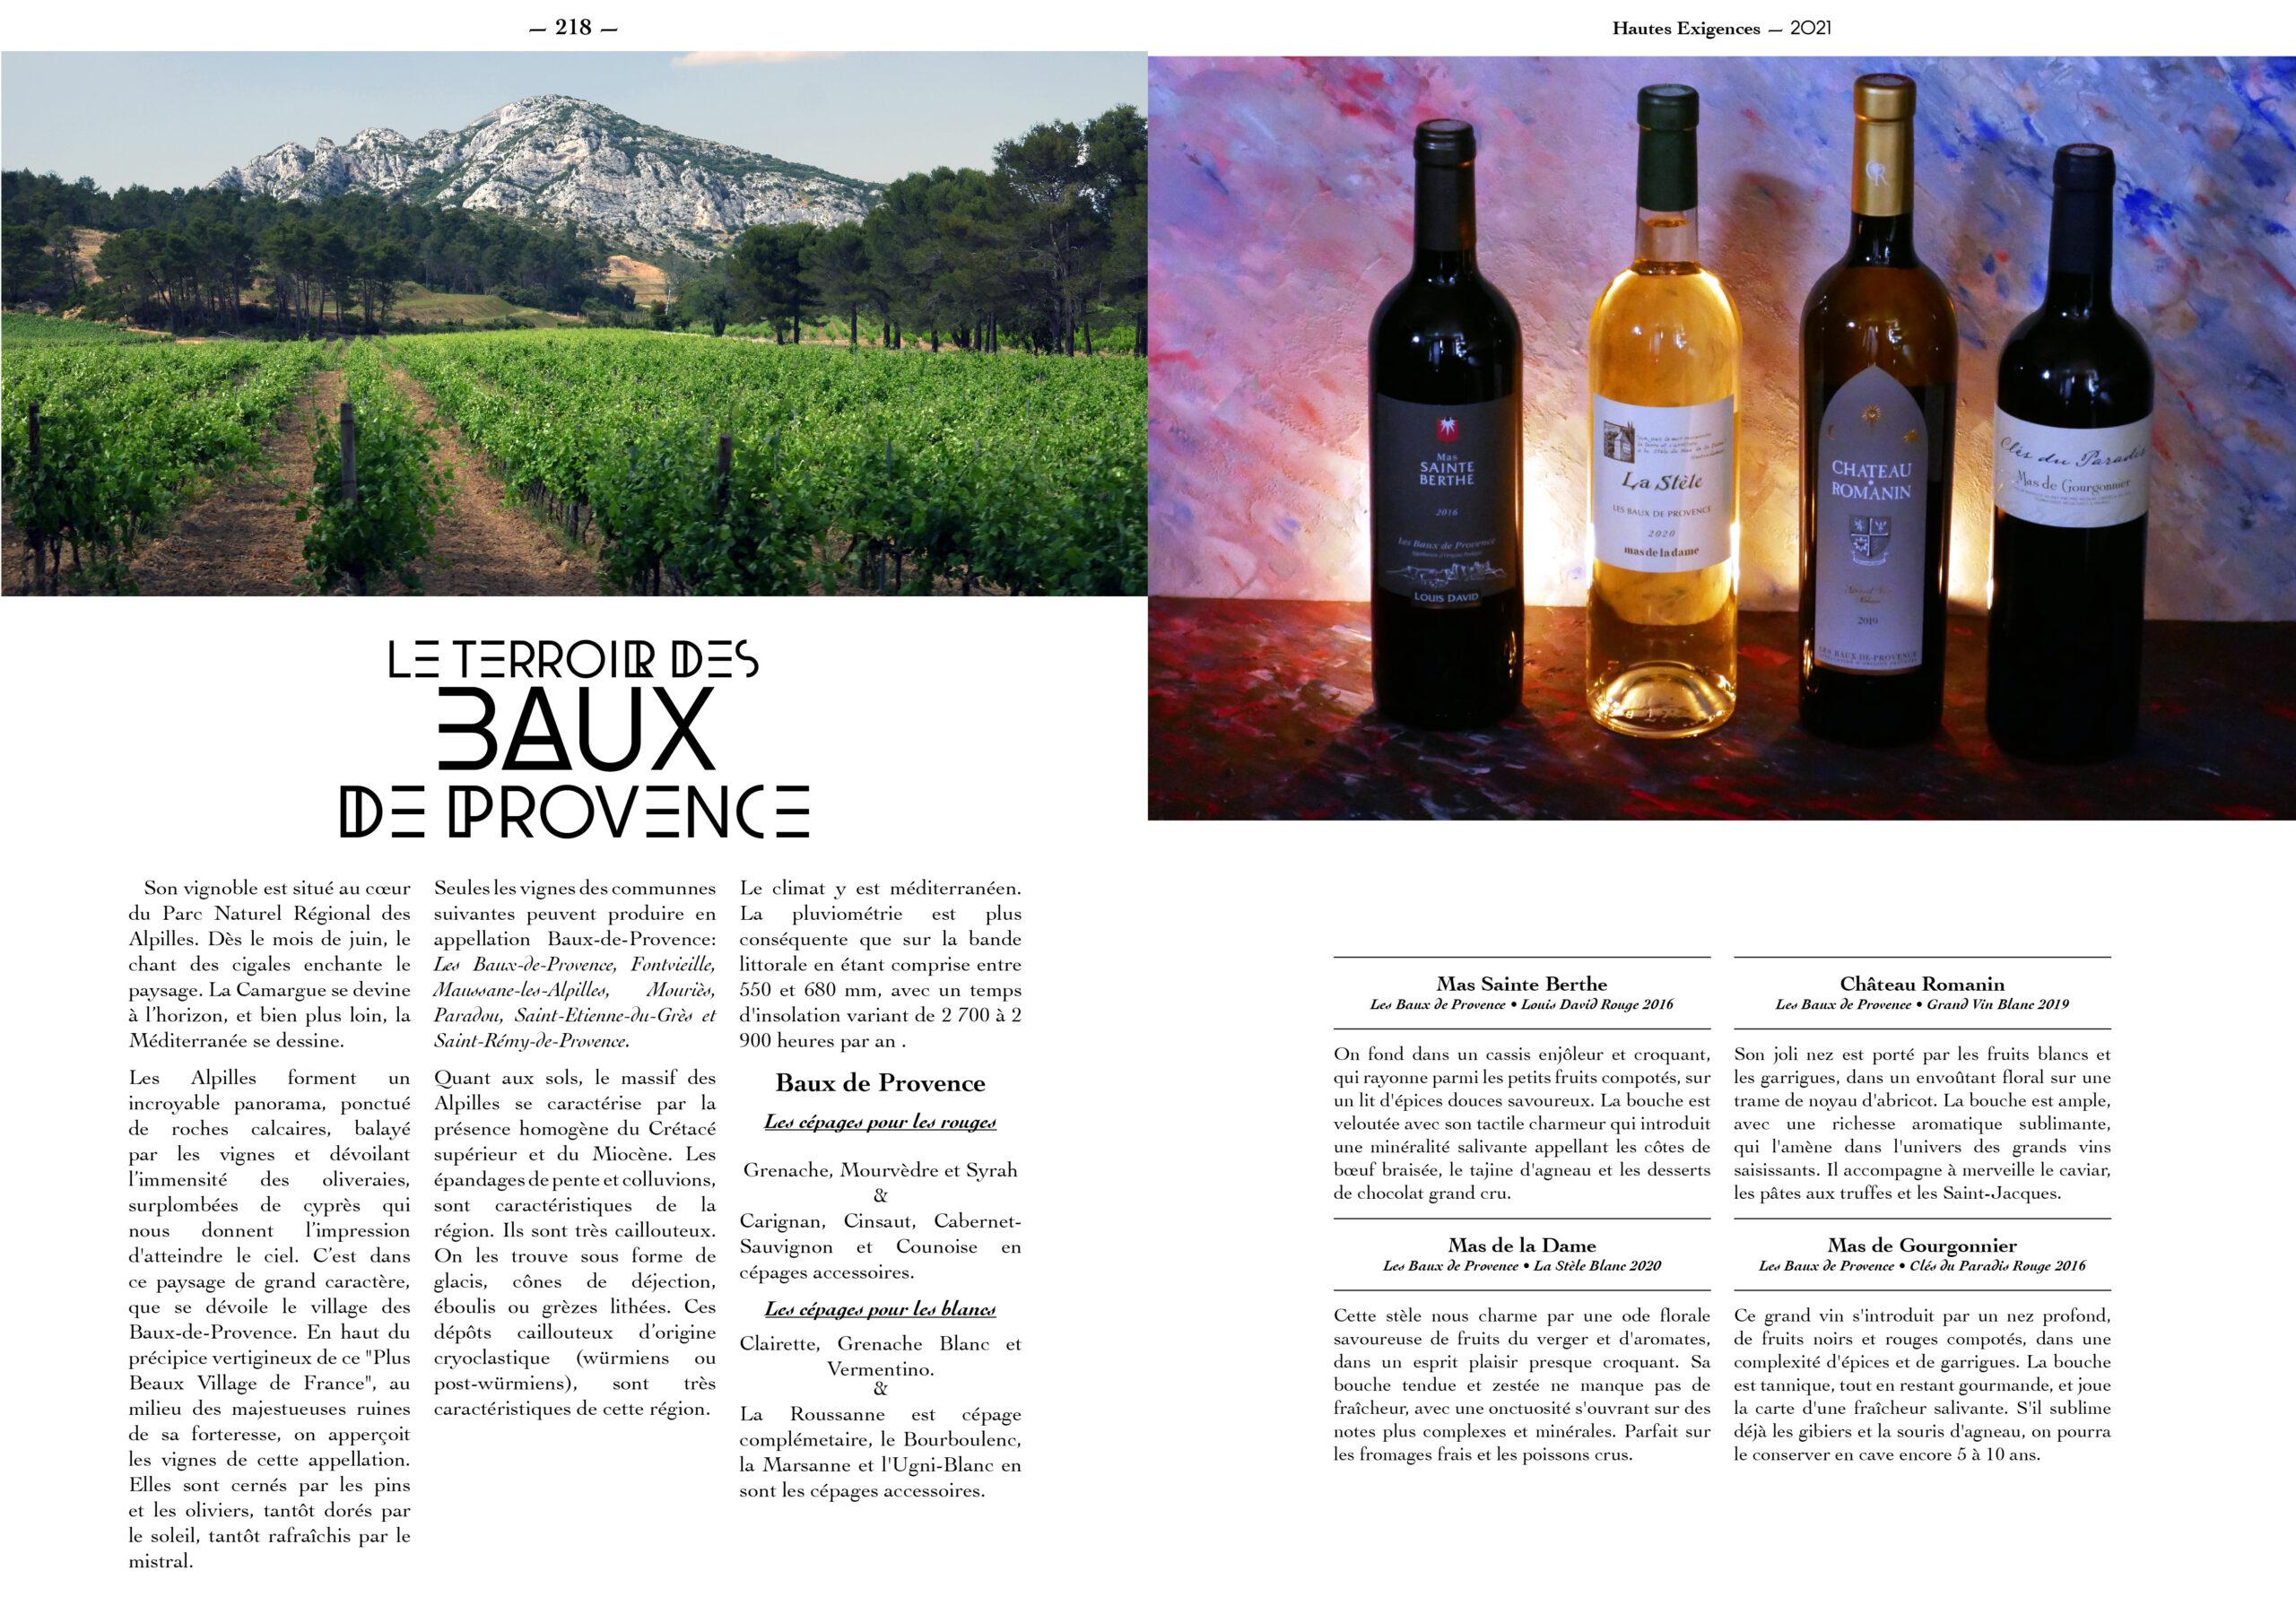 Hautes Exigences Magazine Hors Serie 2021 page 216-217